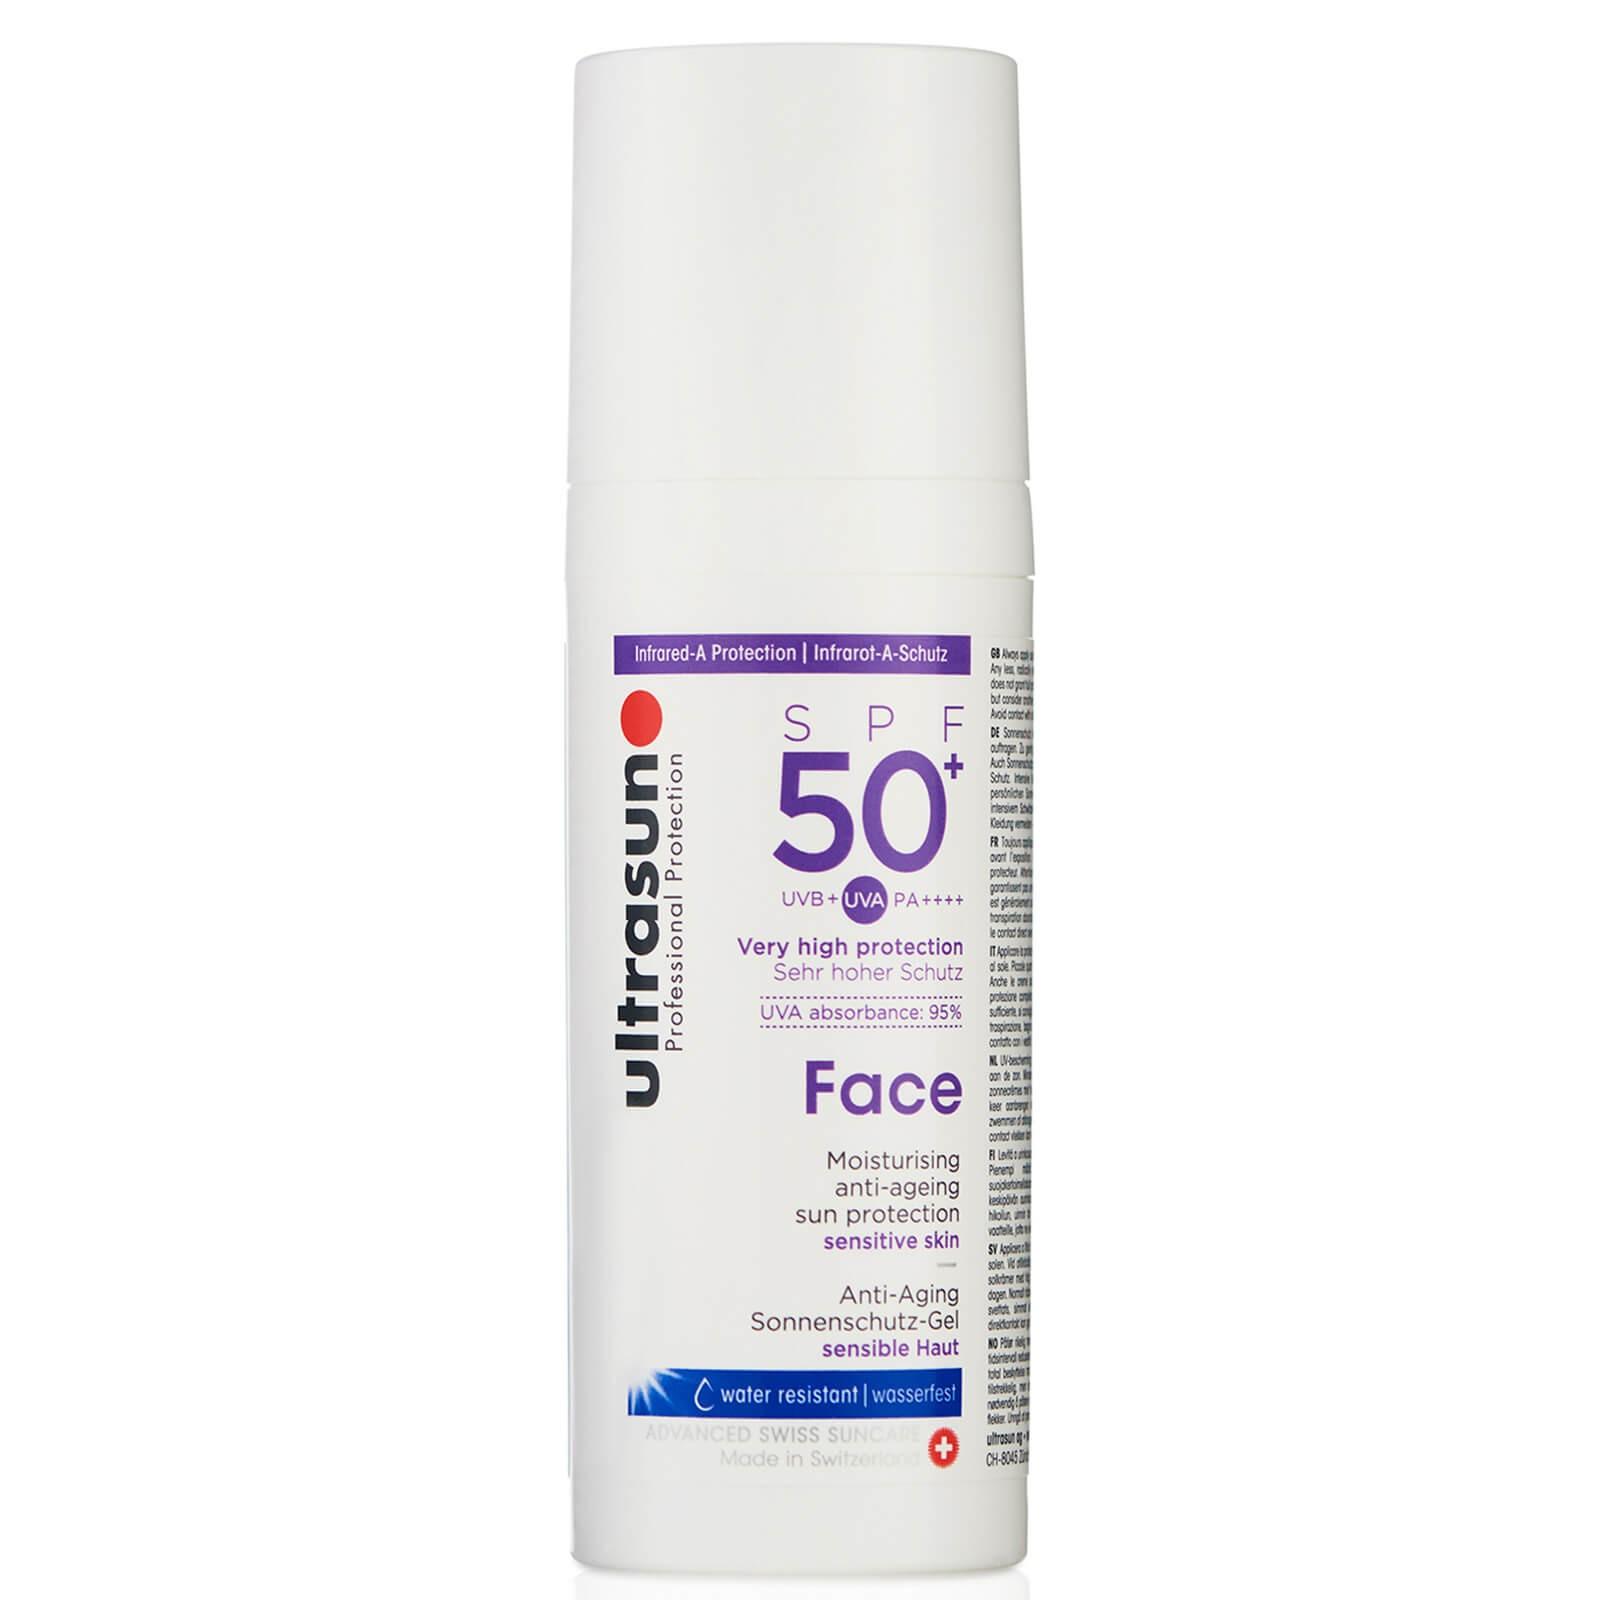 Ultrasun 抗光老化防晒霜 SPF50 50ml